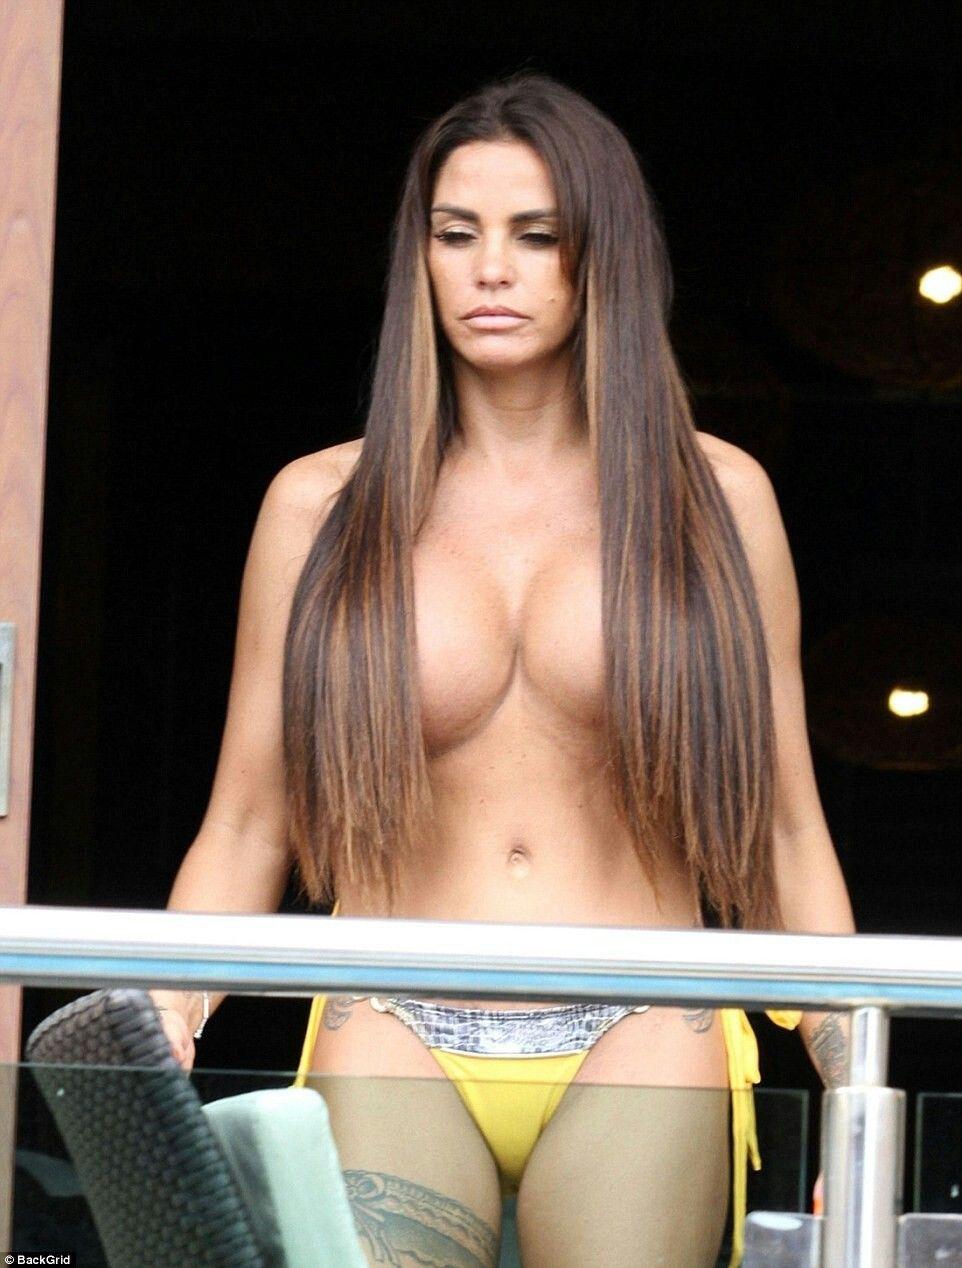 Bikini Vi Shy naked (75 photos), Topless, Paparazzi, Instagram, panties 2020